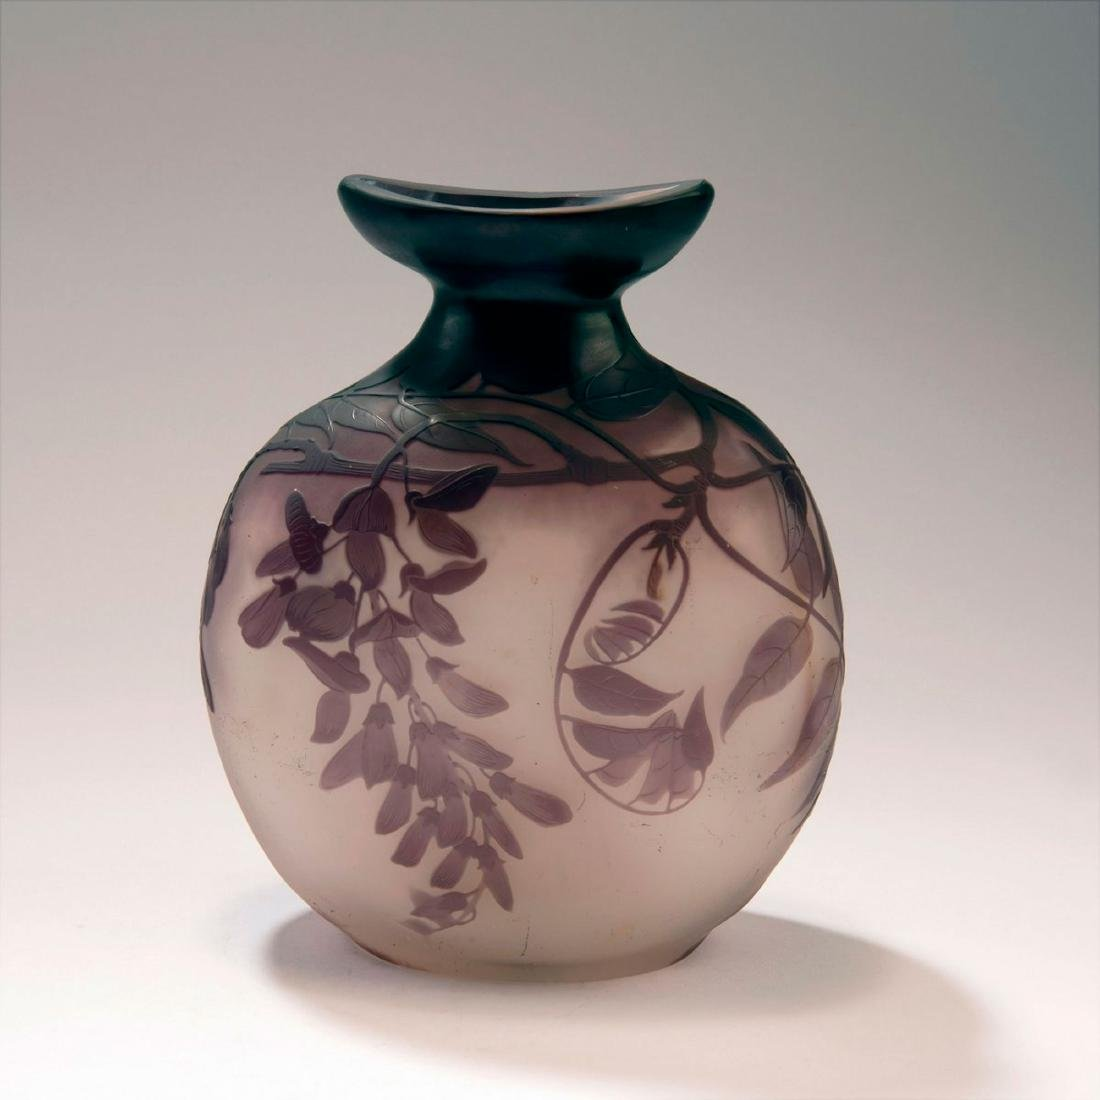 'Glycines' vase, 1902-04